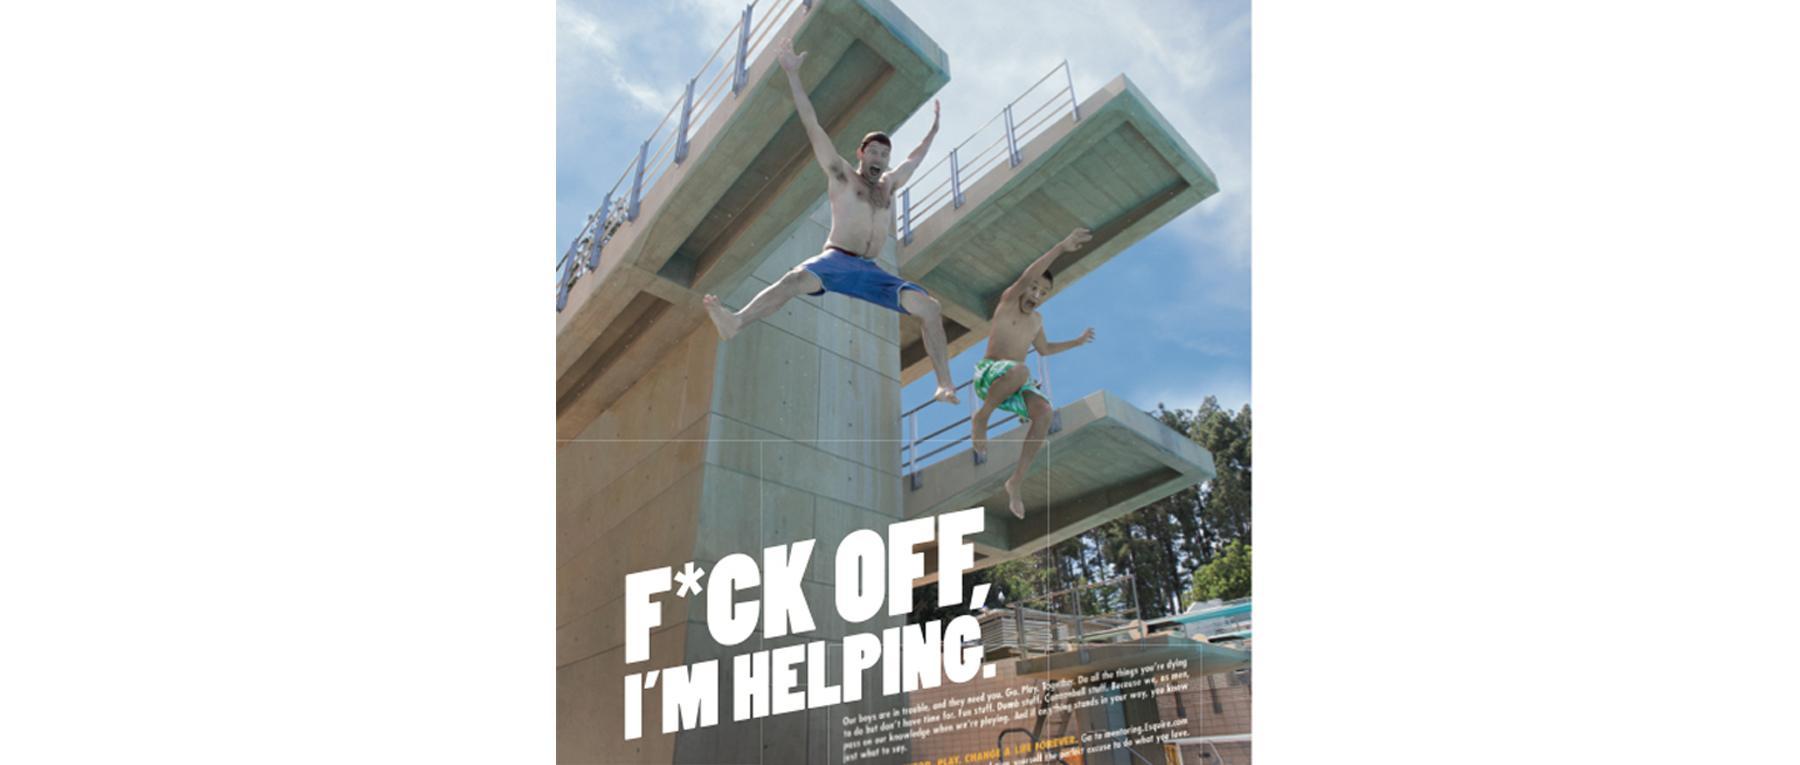 Mentoring gets a new tagline: F*ck Off, I'm Helping  http://t.co/L0XMcRmyfj http://t.co/qGhDNfc09G